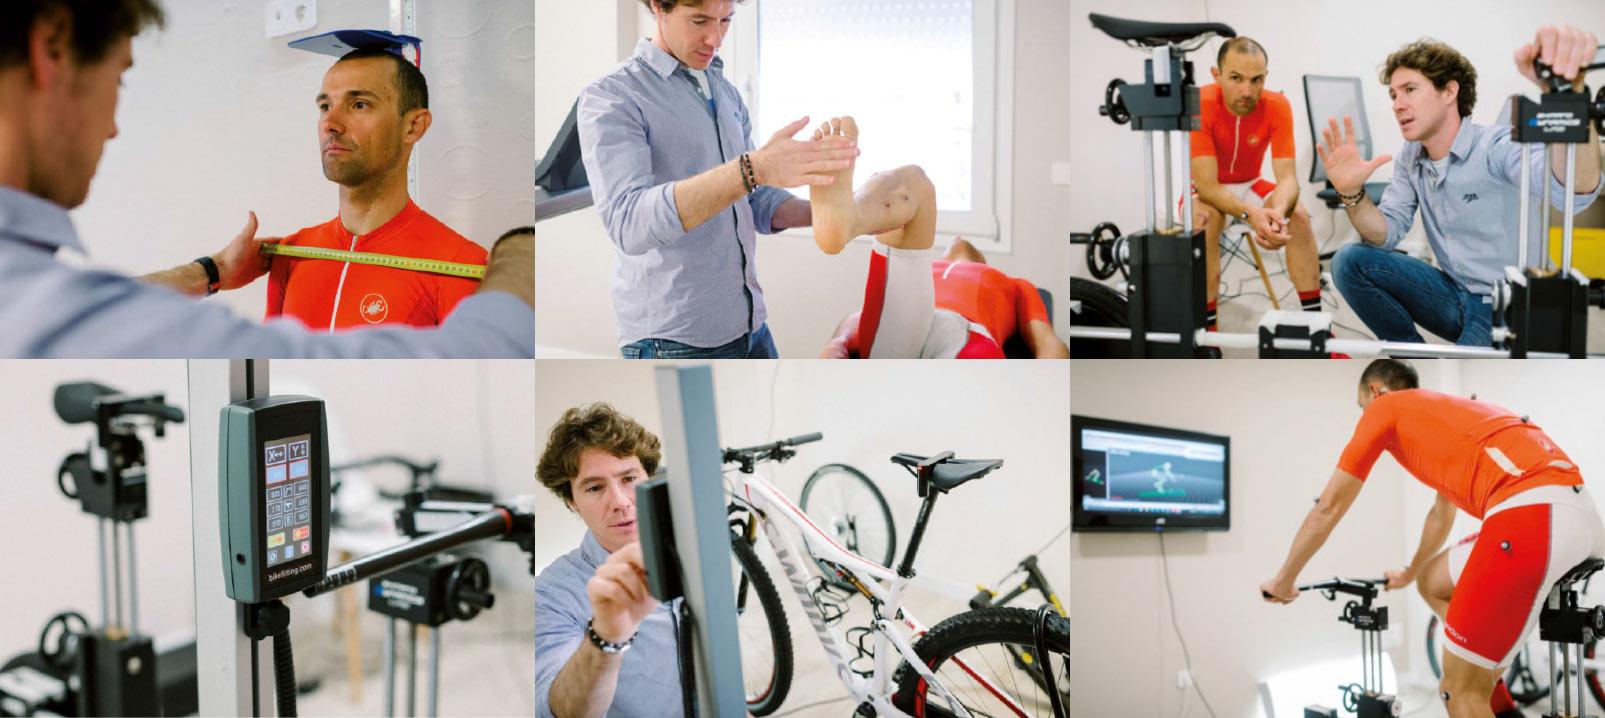 biomecanica-ciclismo-macrociclo